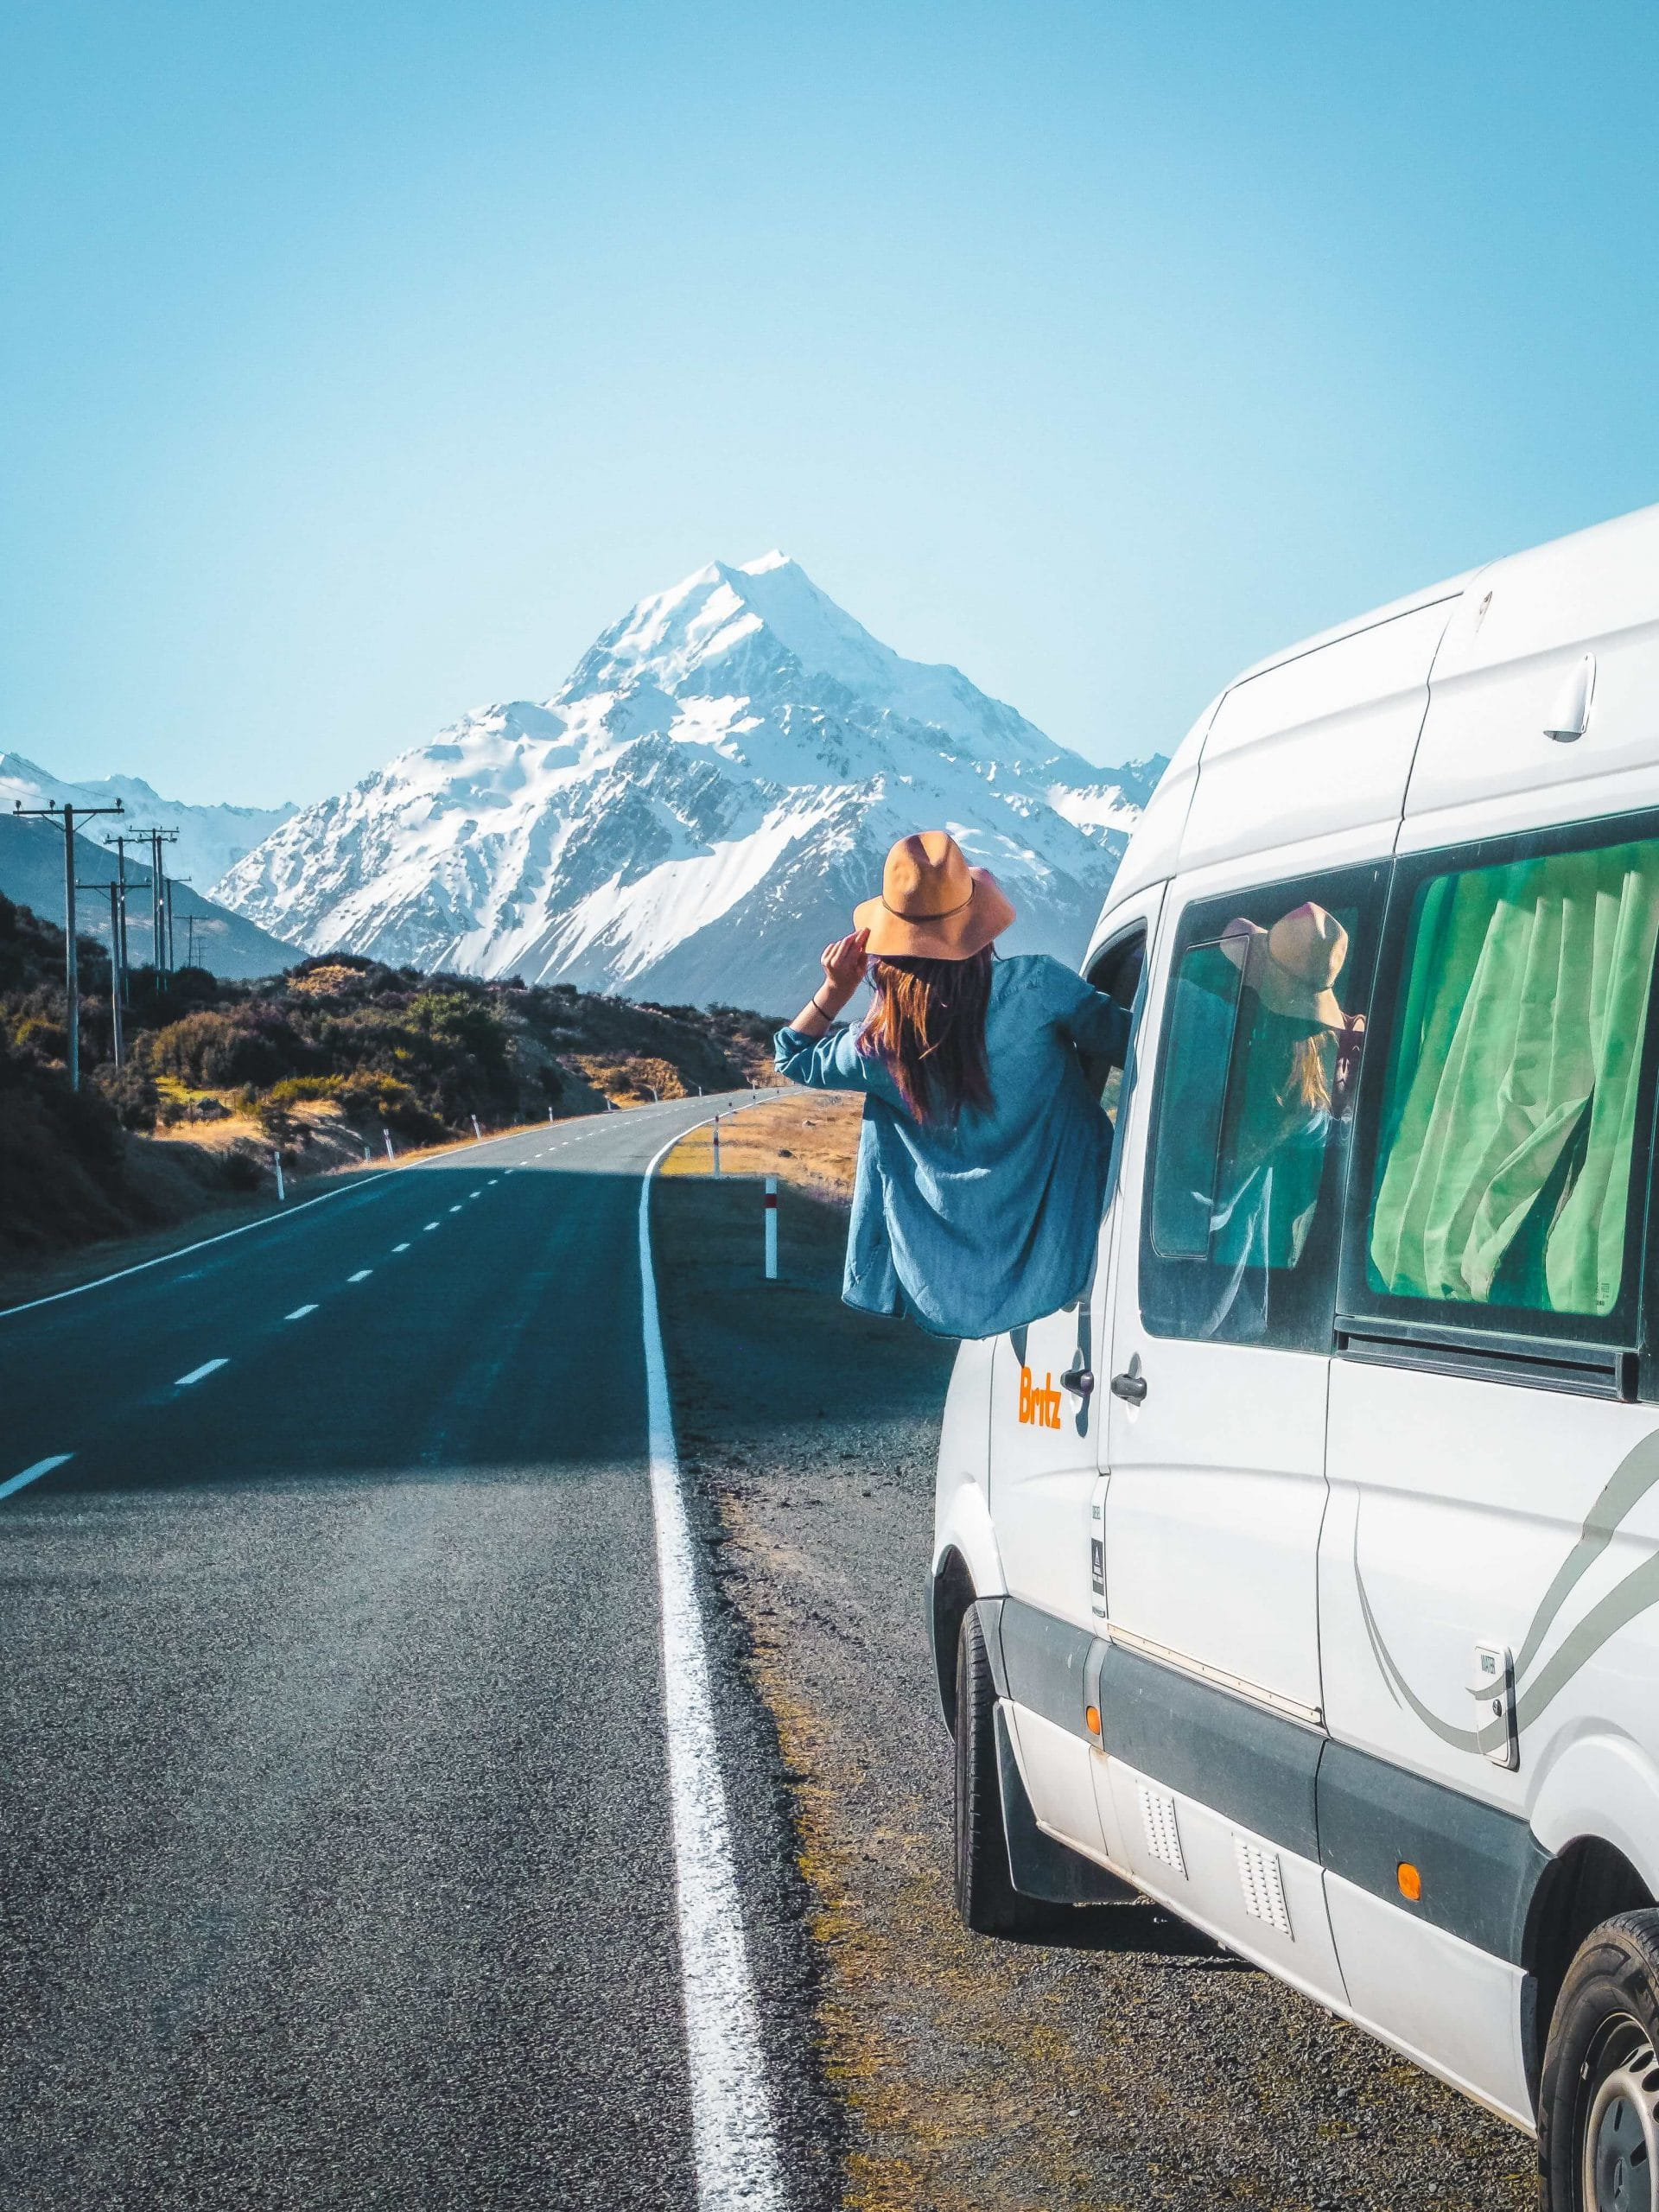 Roadtripping with Britz Campervans in Mt. Cook National Park